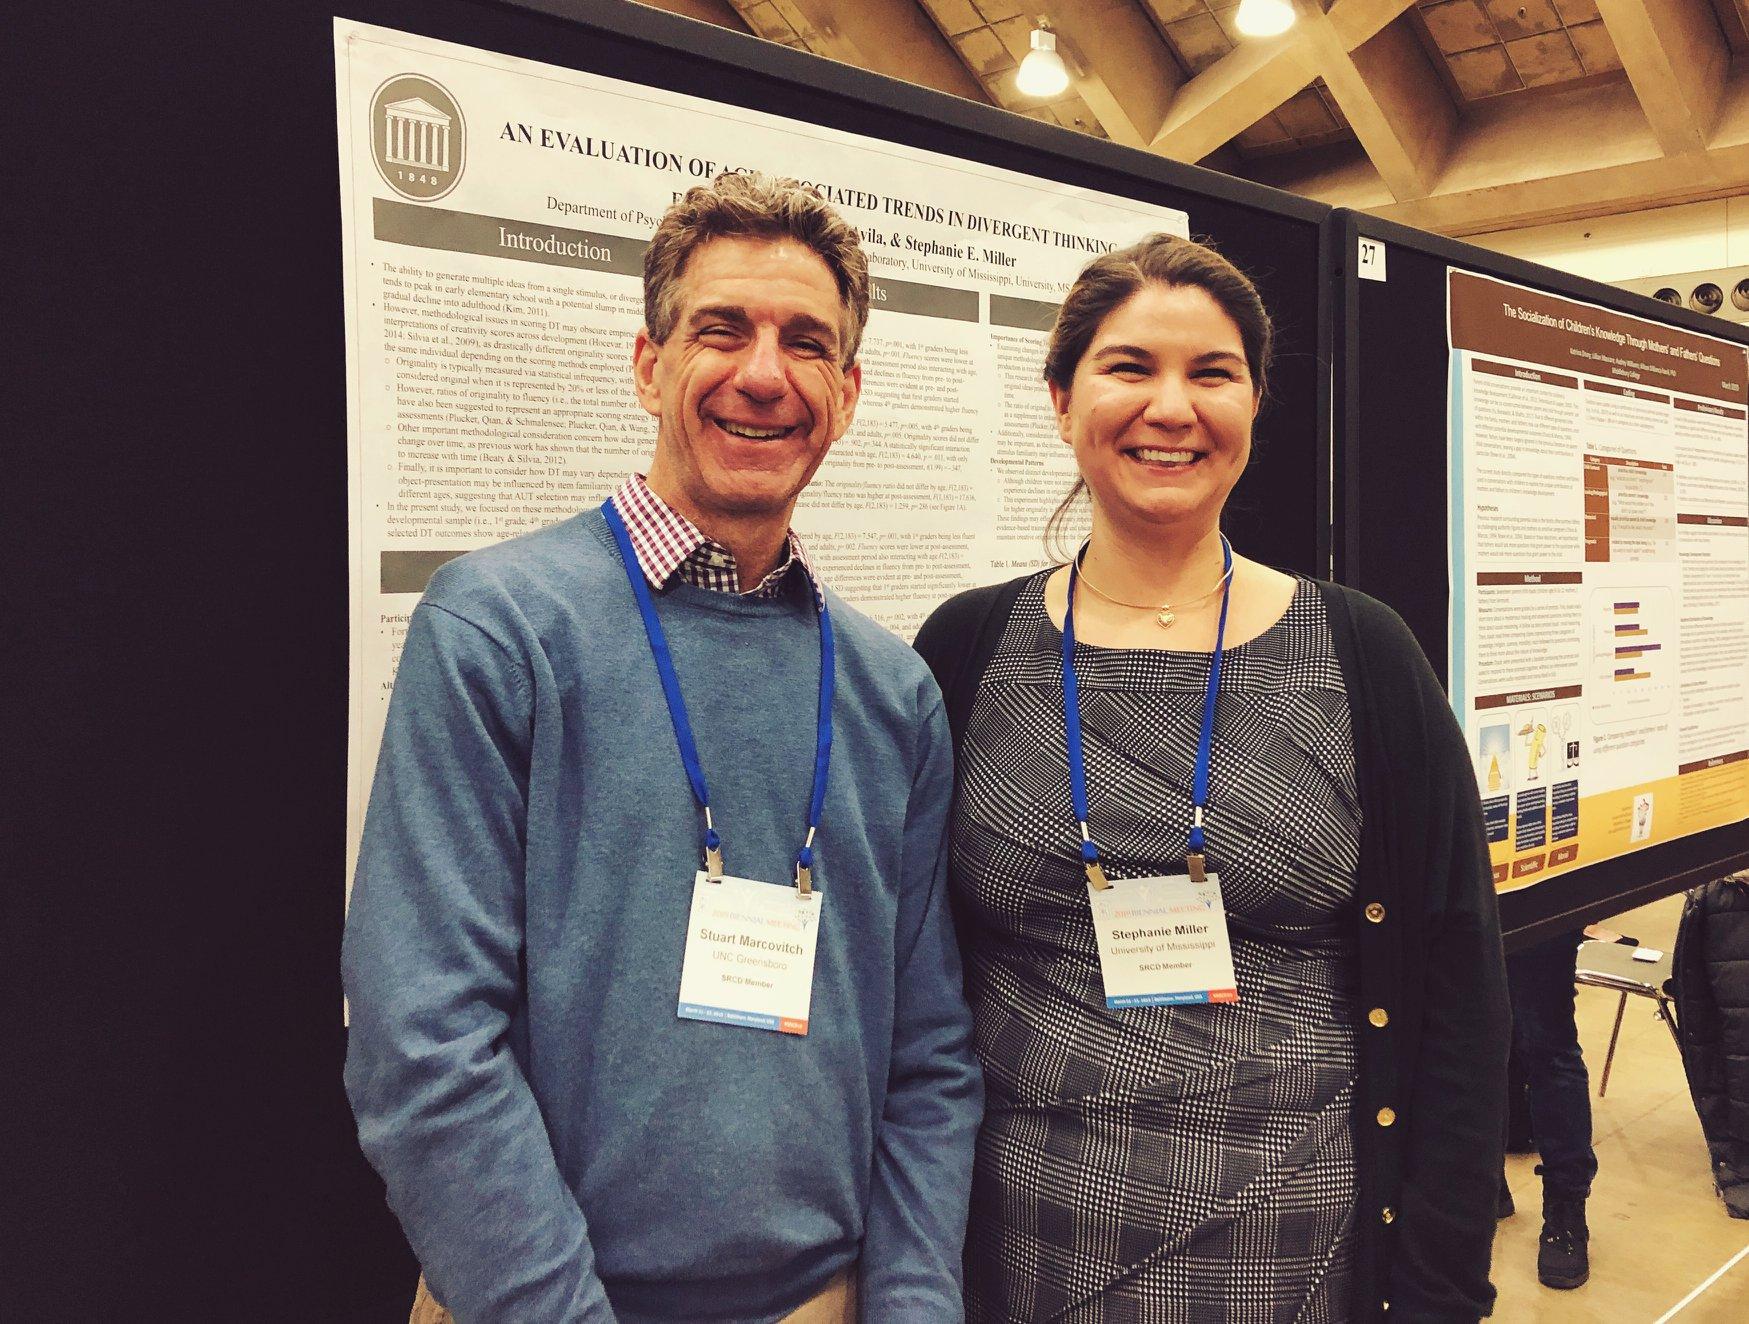 Dr. Stuart Marcovitch & DUCK alumna Dr. Stephanie Miller